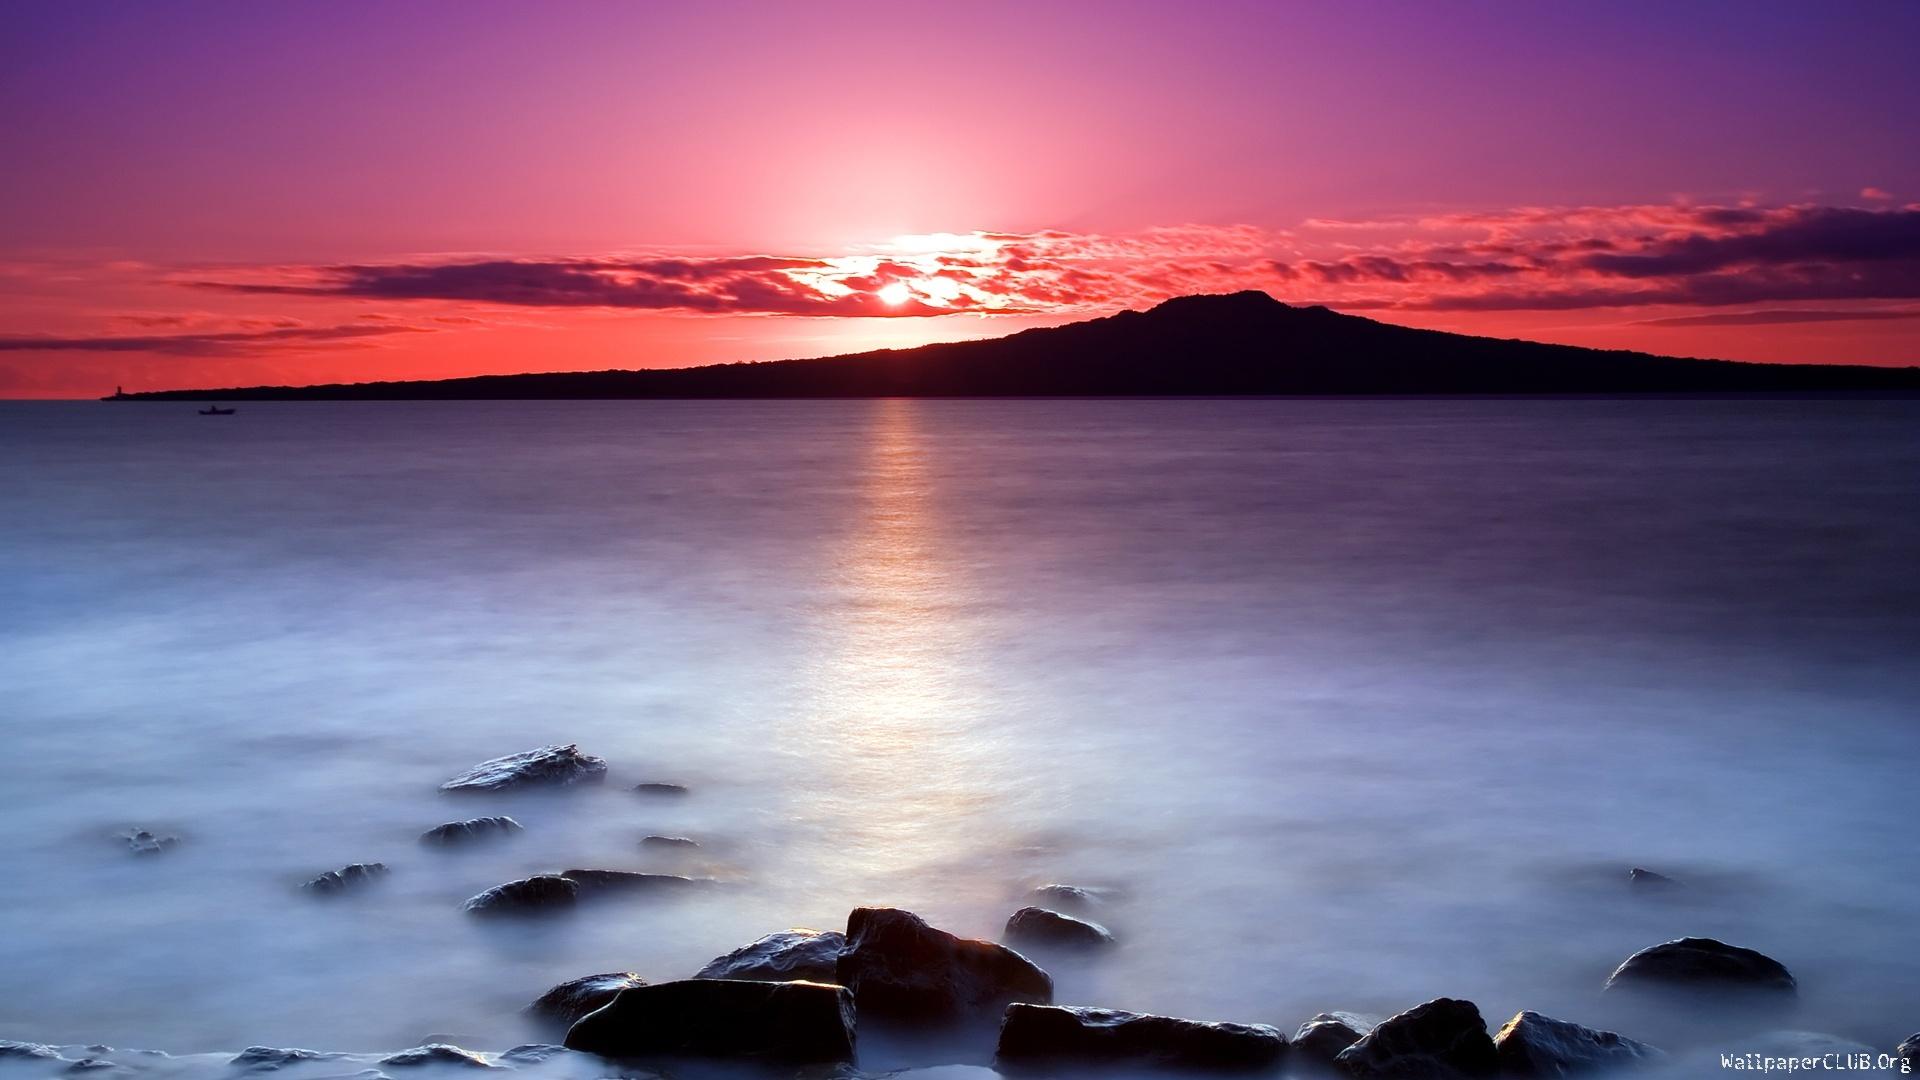 Sunset Nature Picture HD Wallpaper WallpaperLepi 1920x1080